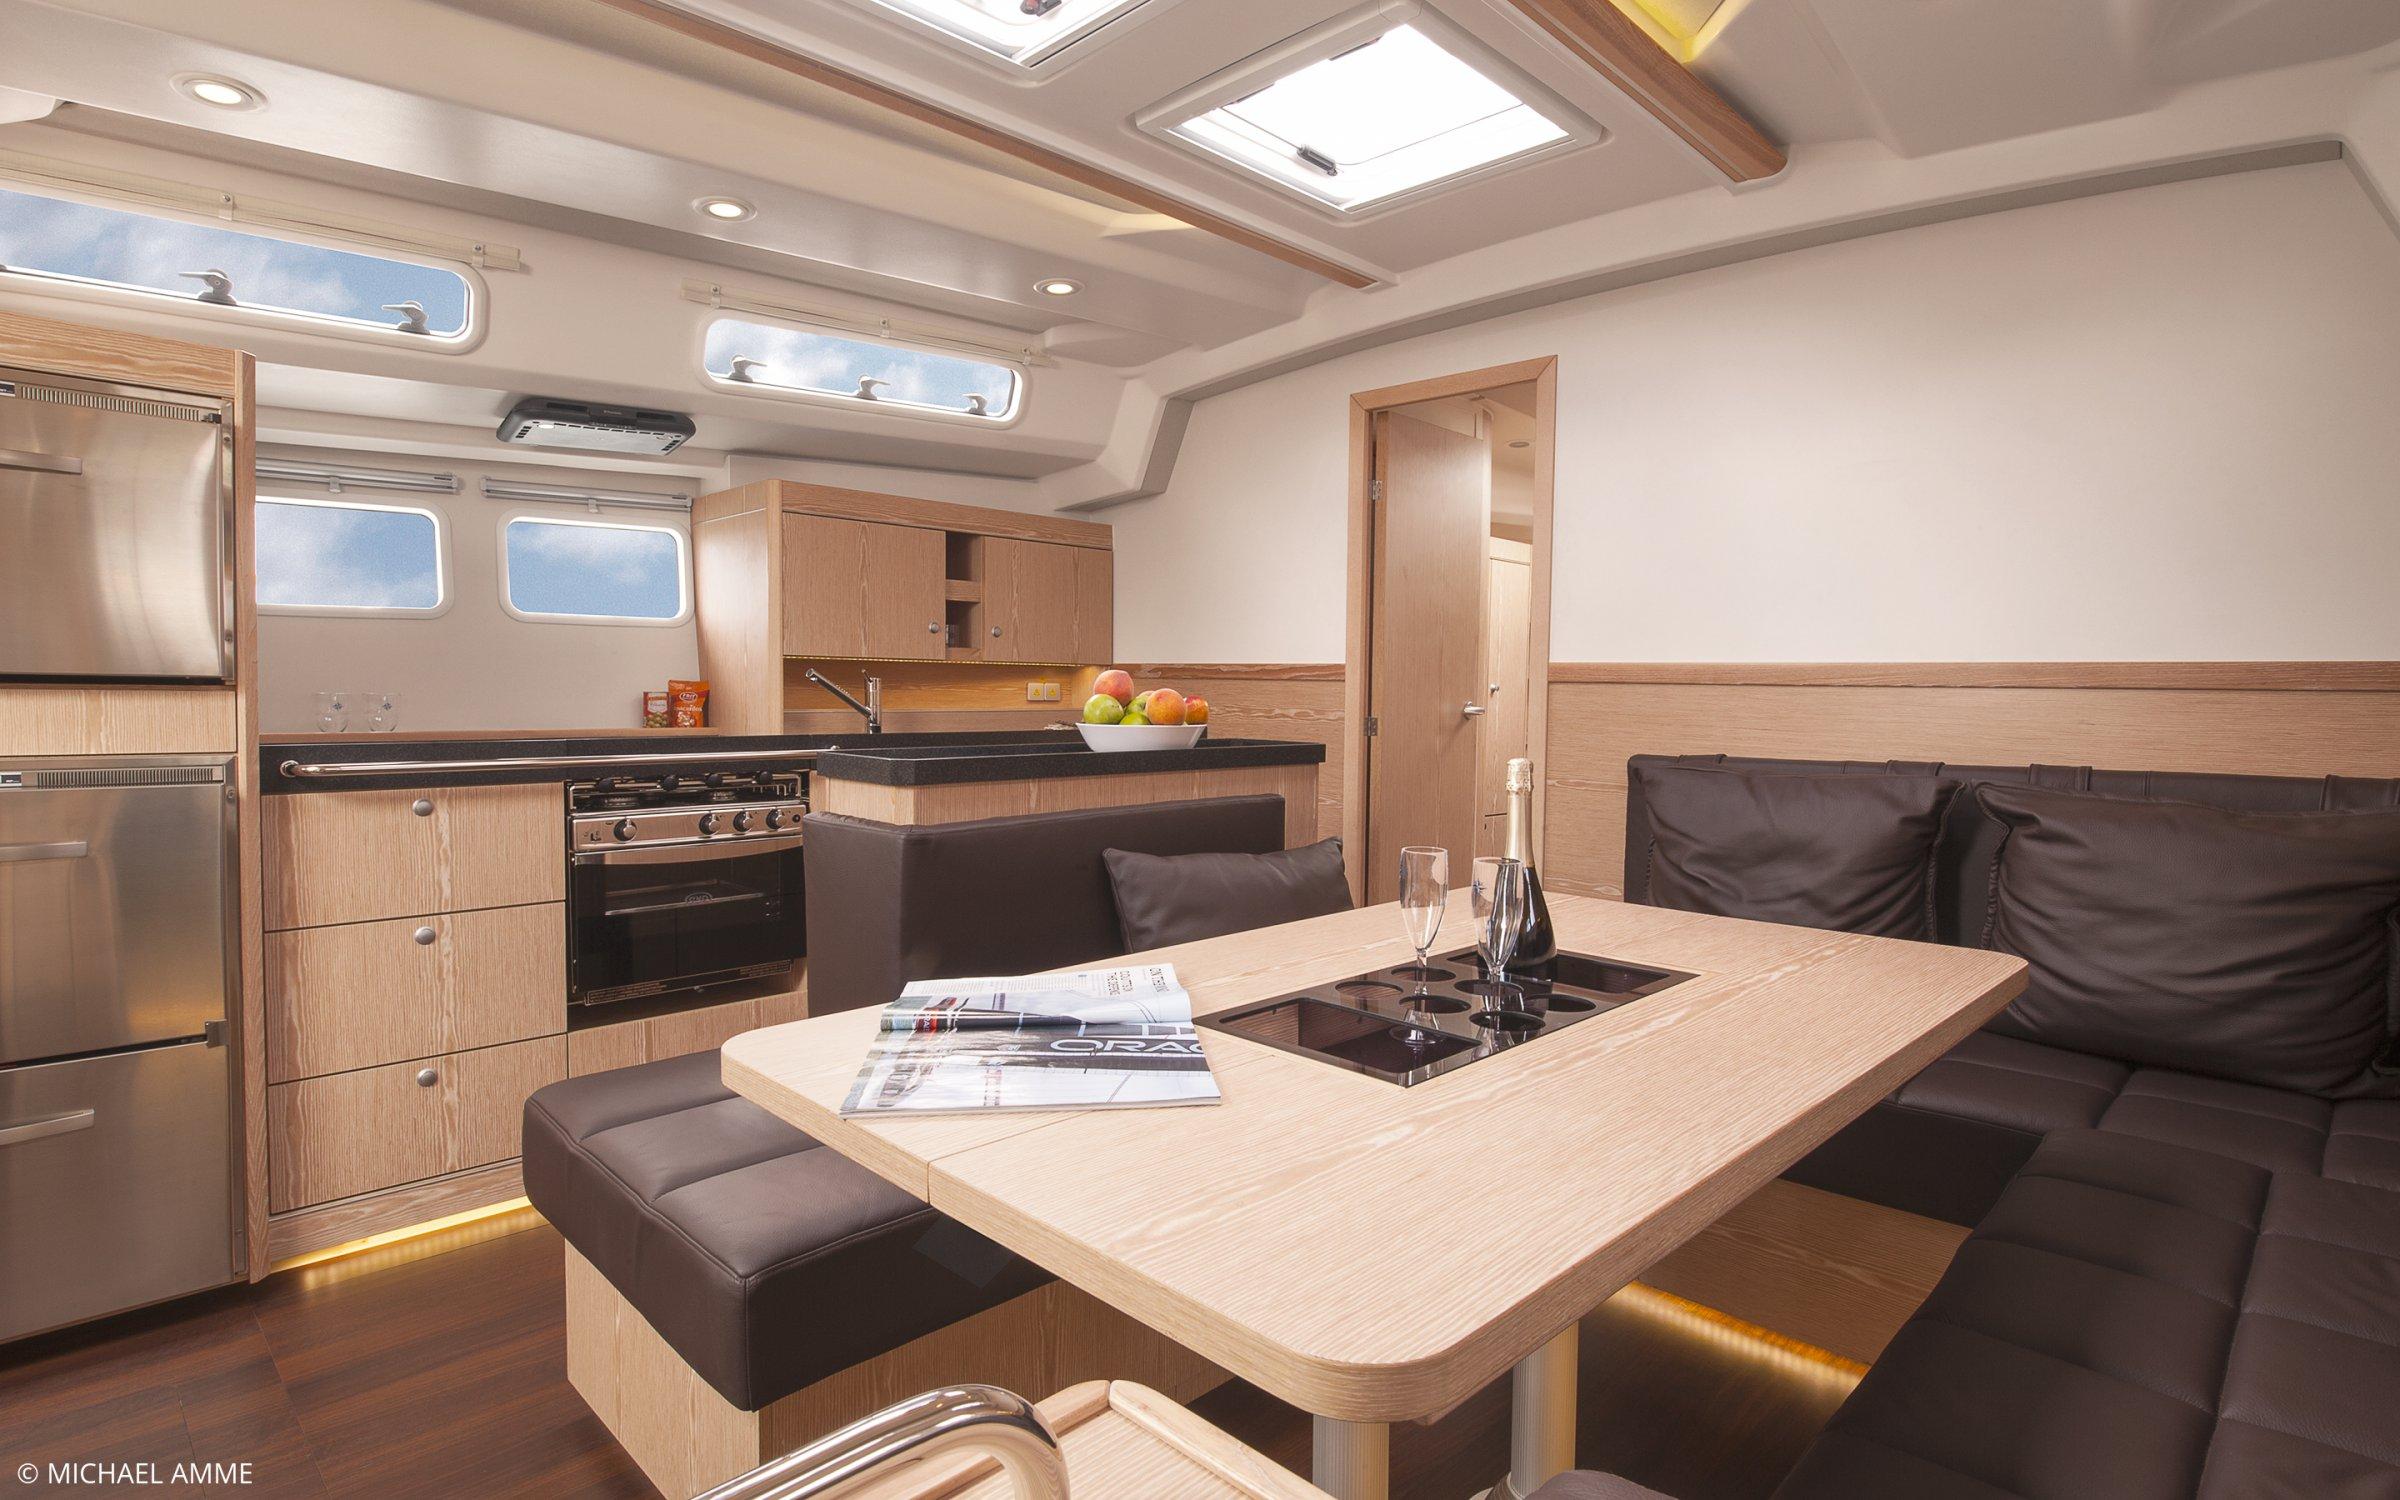 Boot Segelyachten 46 ft - 50 ft Interieur